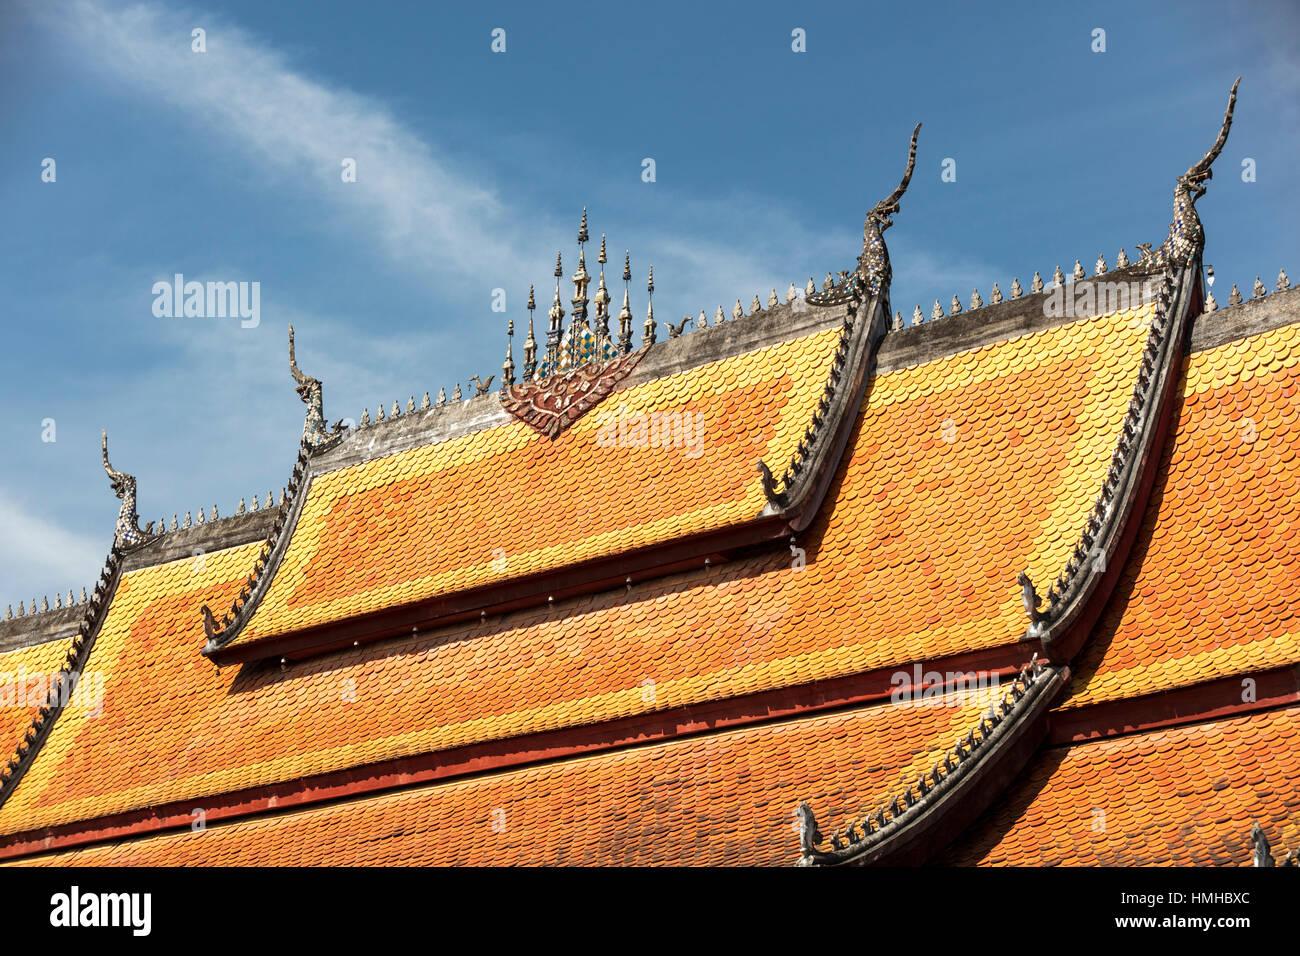 Roof of Wat Sensouhkaram, Sakkarine Rd, Luang Prabang, Laos - Stock Image